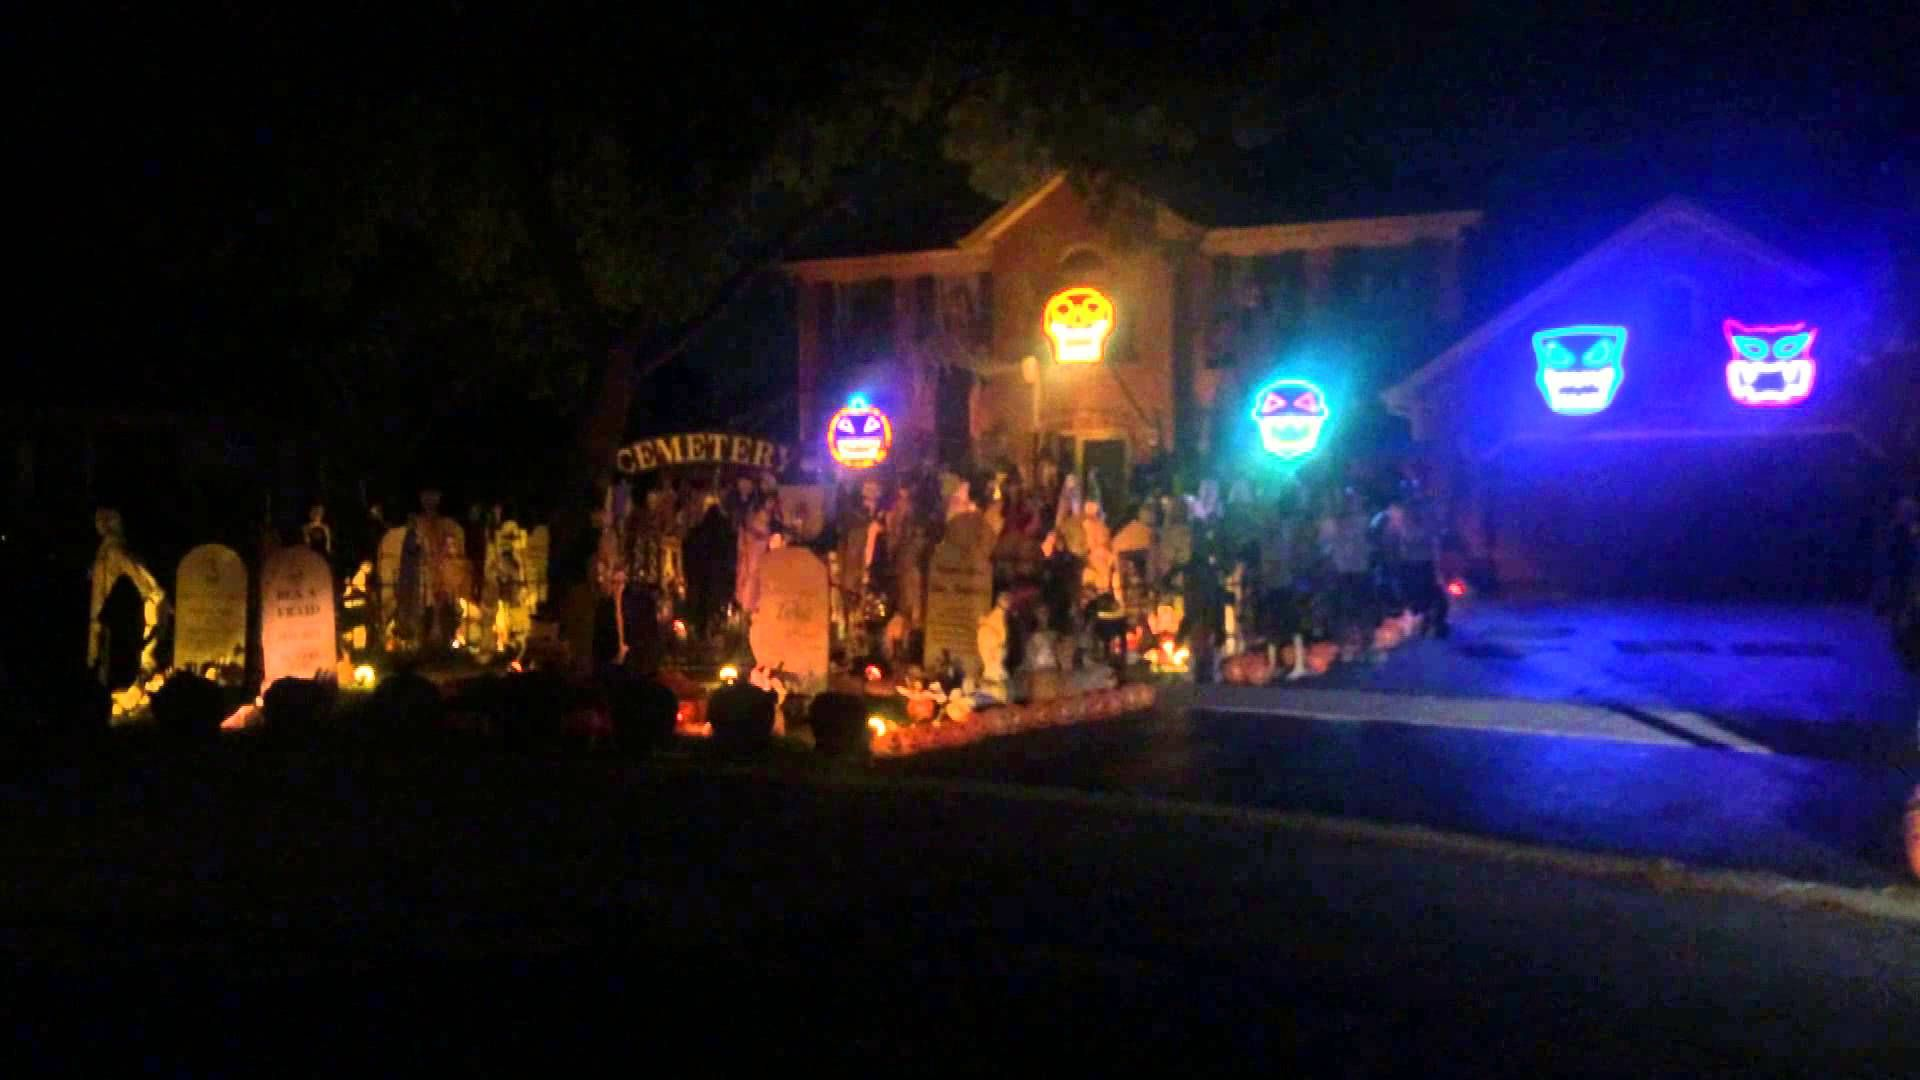 Thomas Halloween 2014, Conan Doyle Rd, Naperville IL. 96